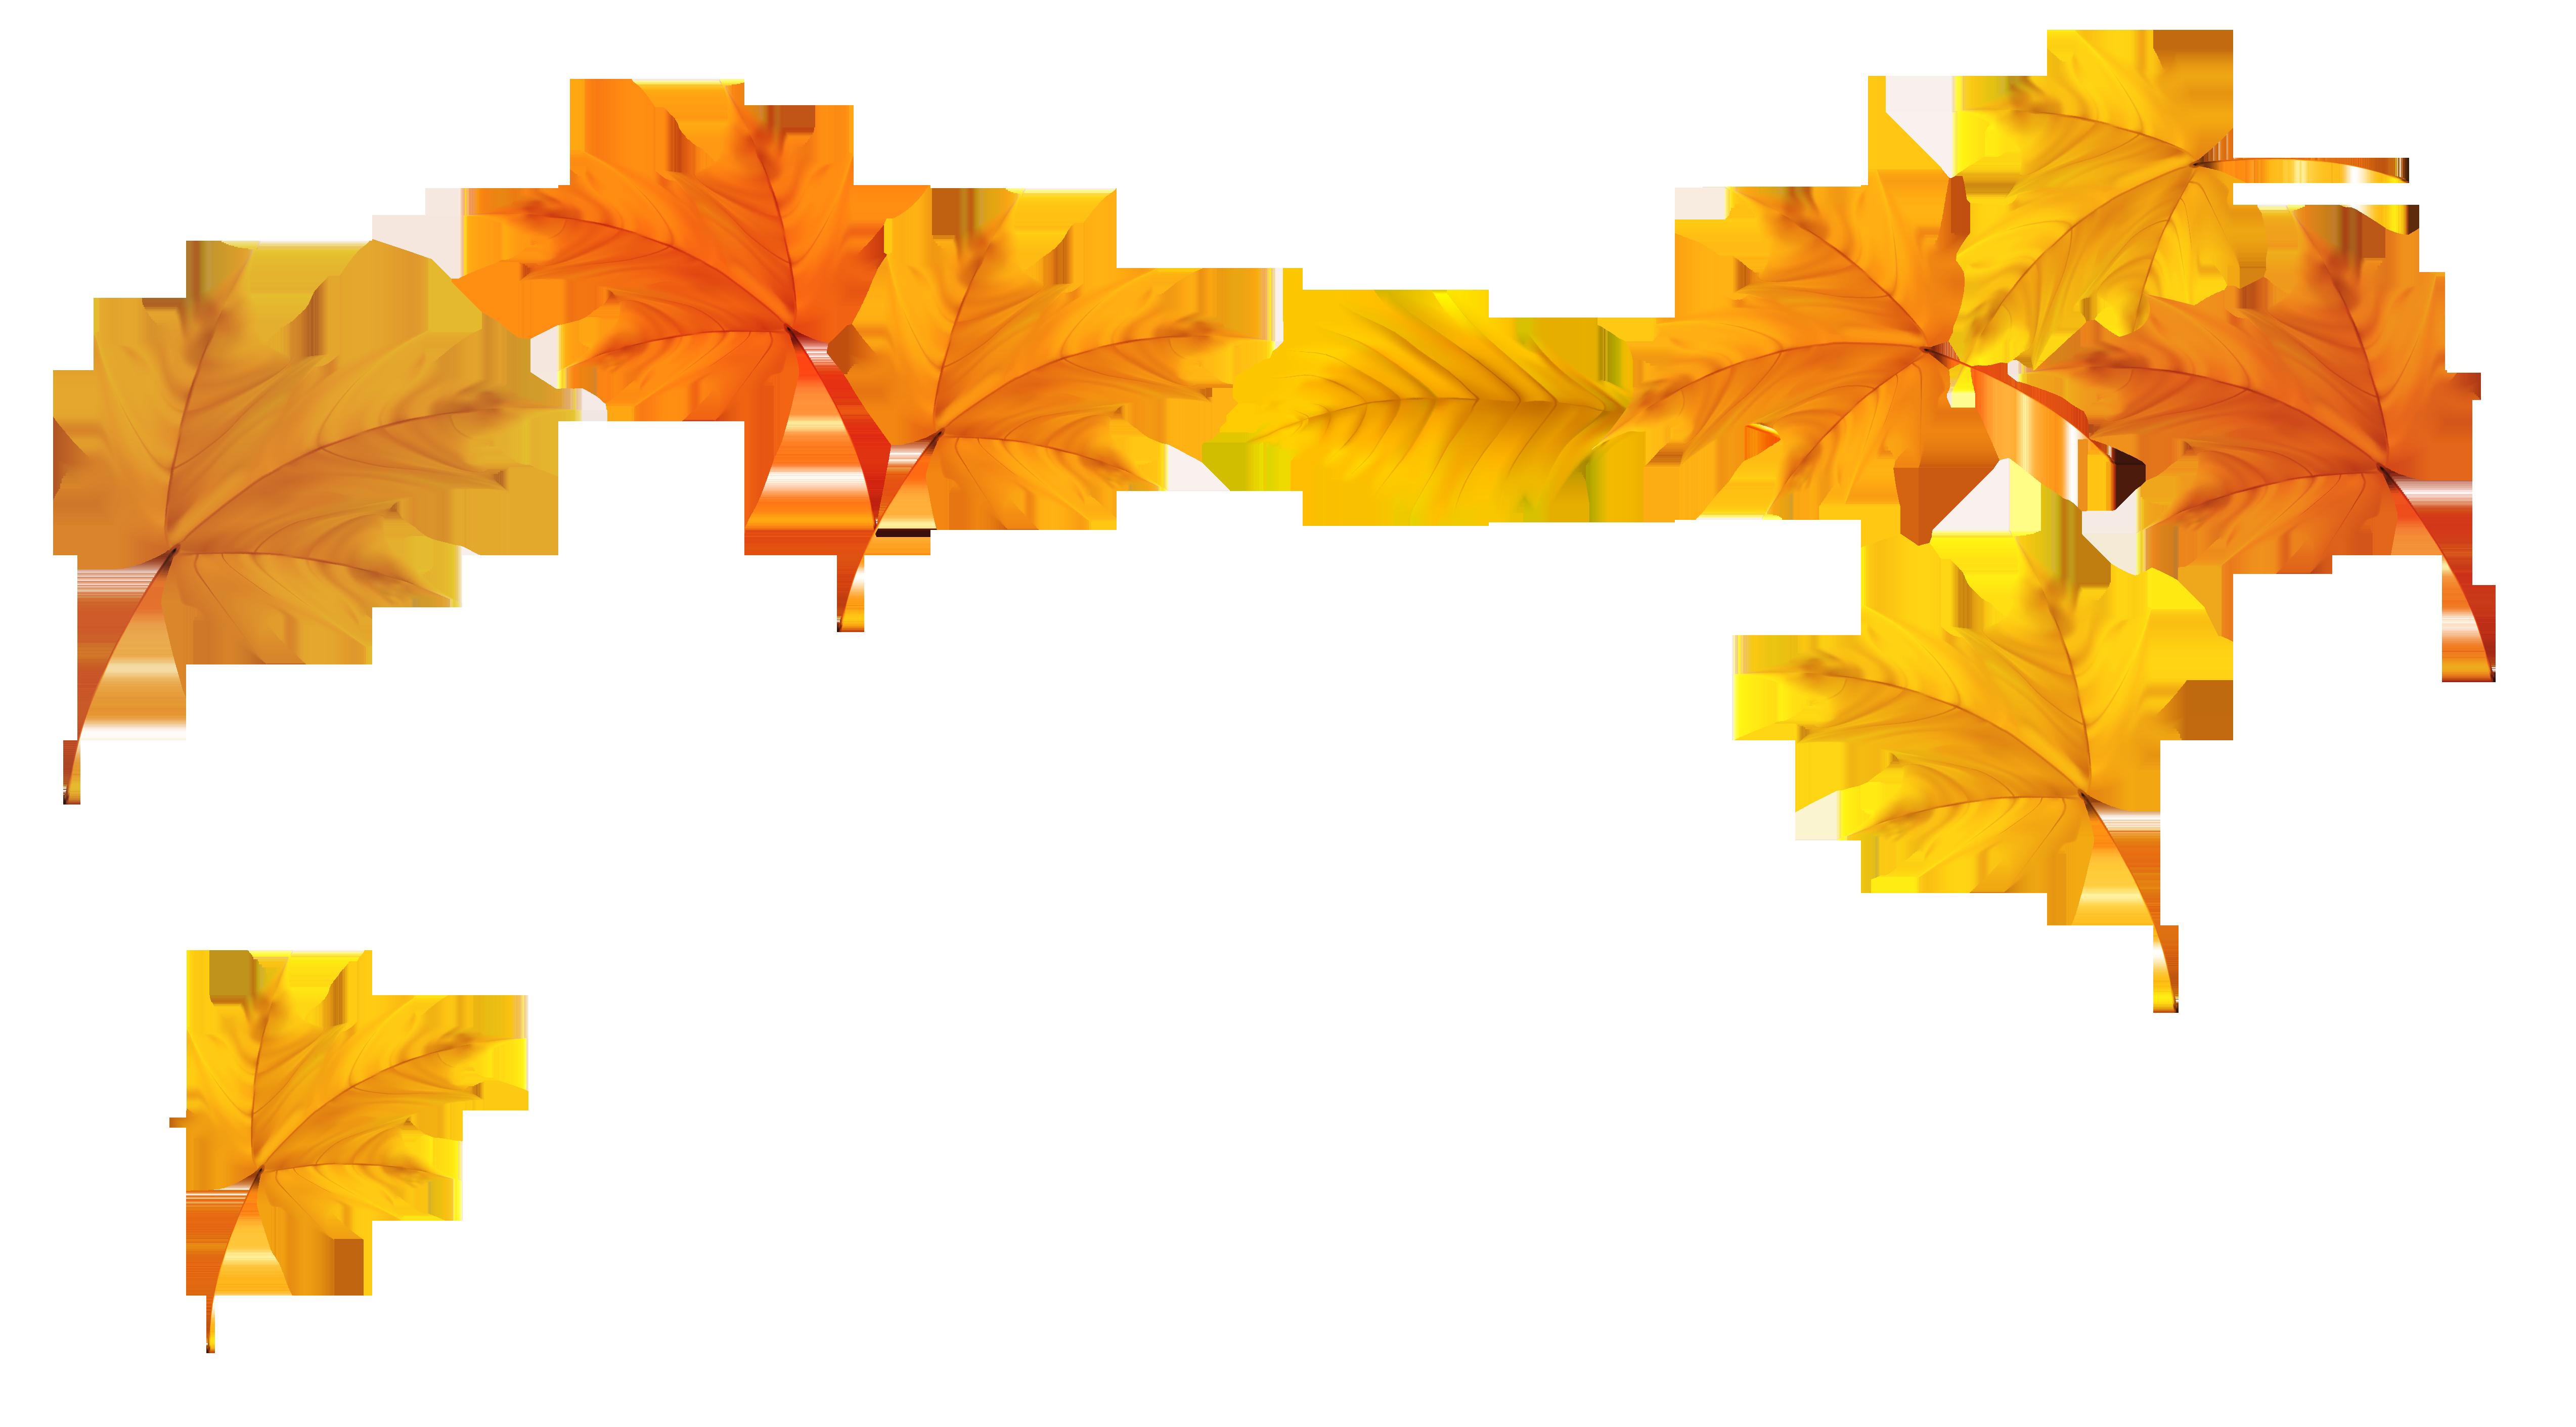 autumn leaf clip art #7-autumn leaf clip art #7-12